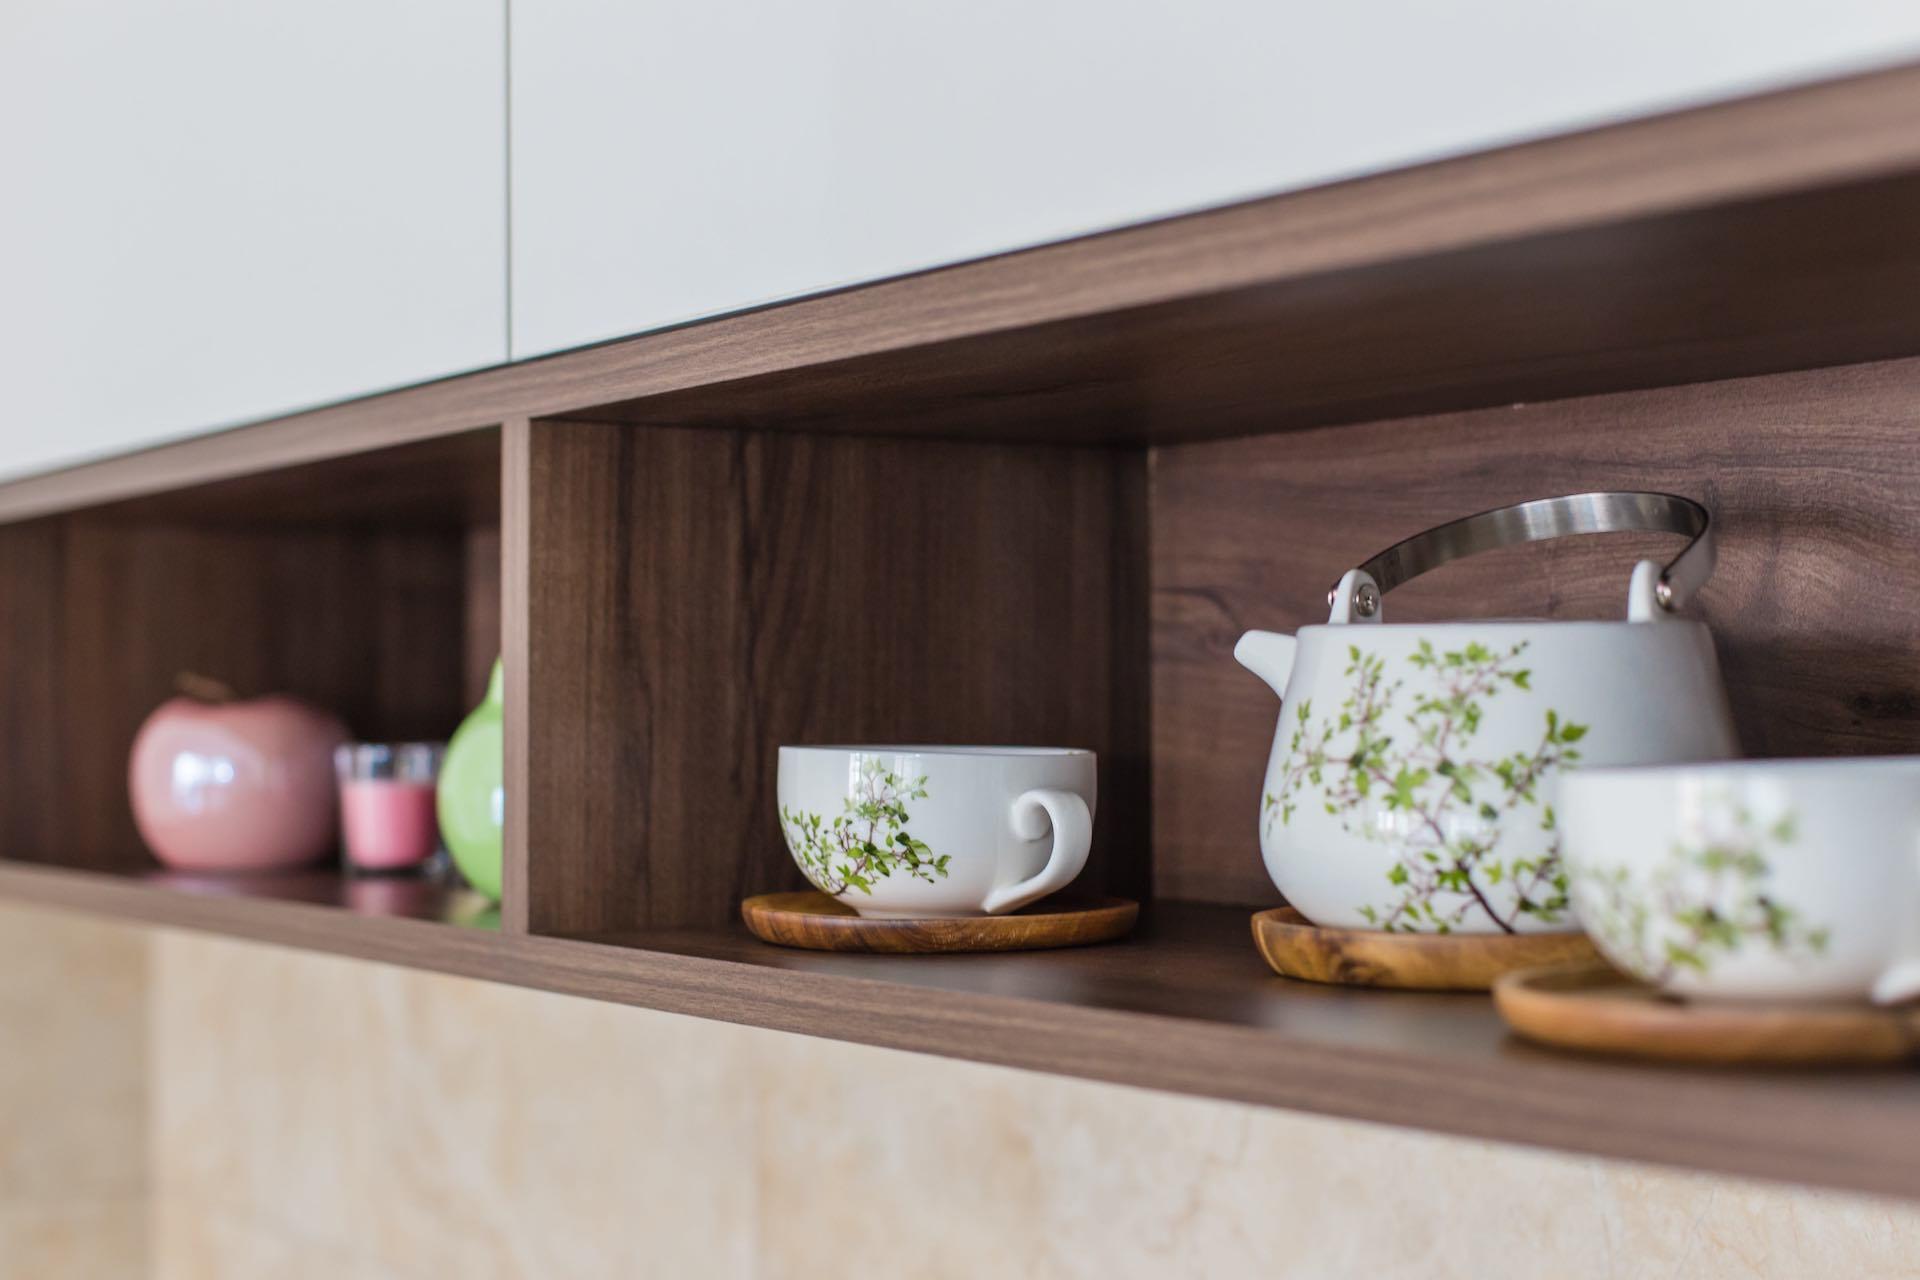 One Bedroom Apartments Aparthotel Anatolia Becici Budva Montenegro Best Hotel Book Now 31.jpg